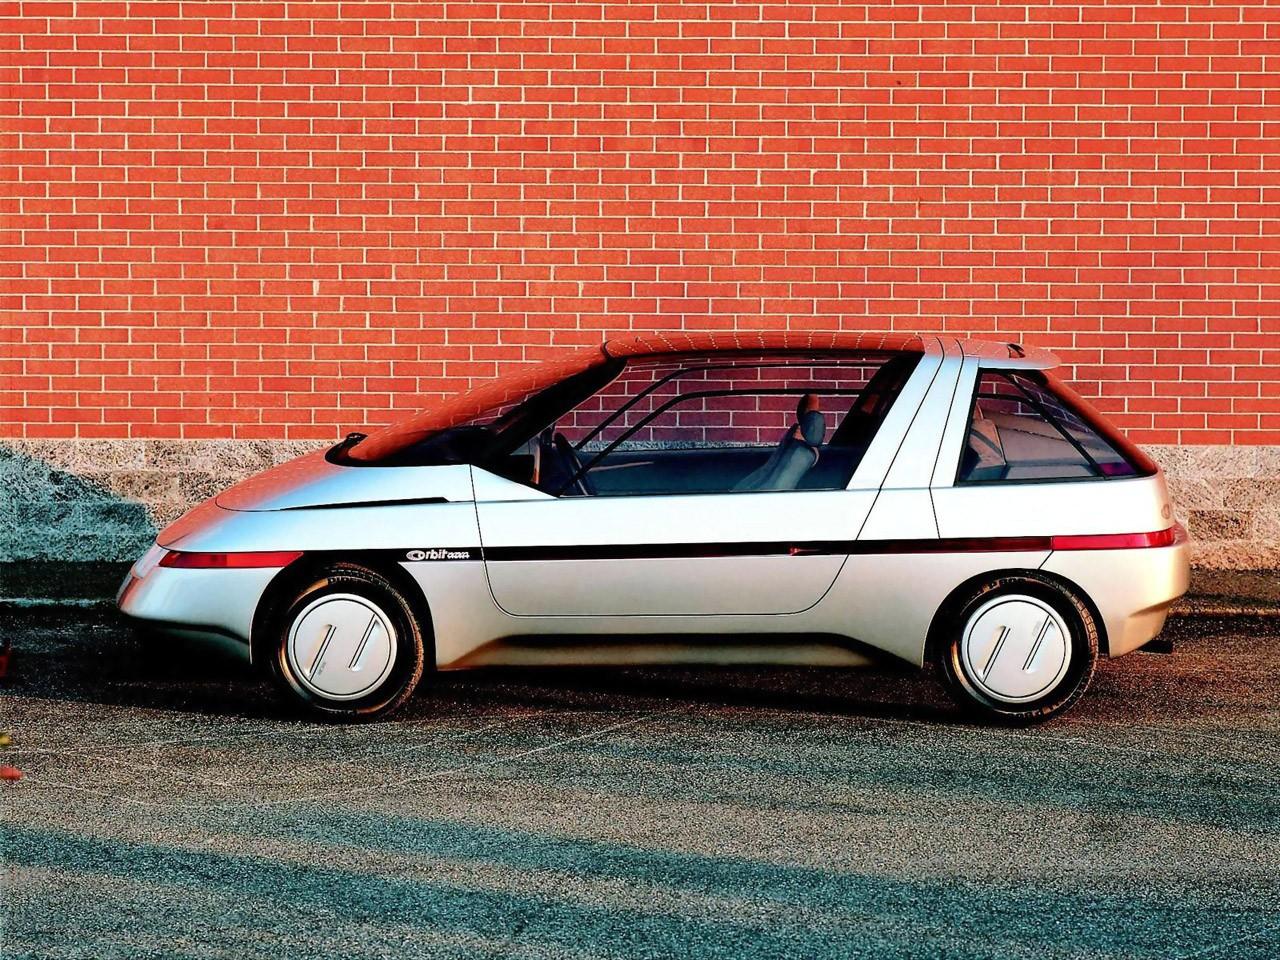 1986 Italdesign Orbit Prototype